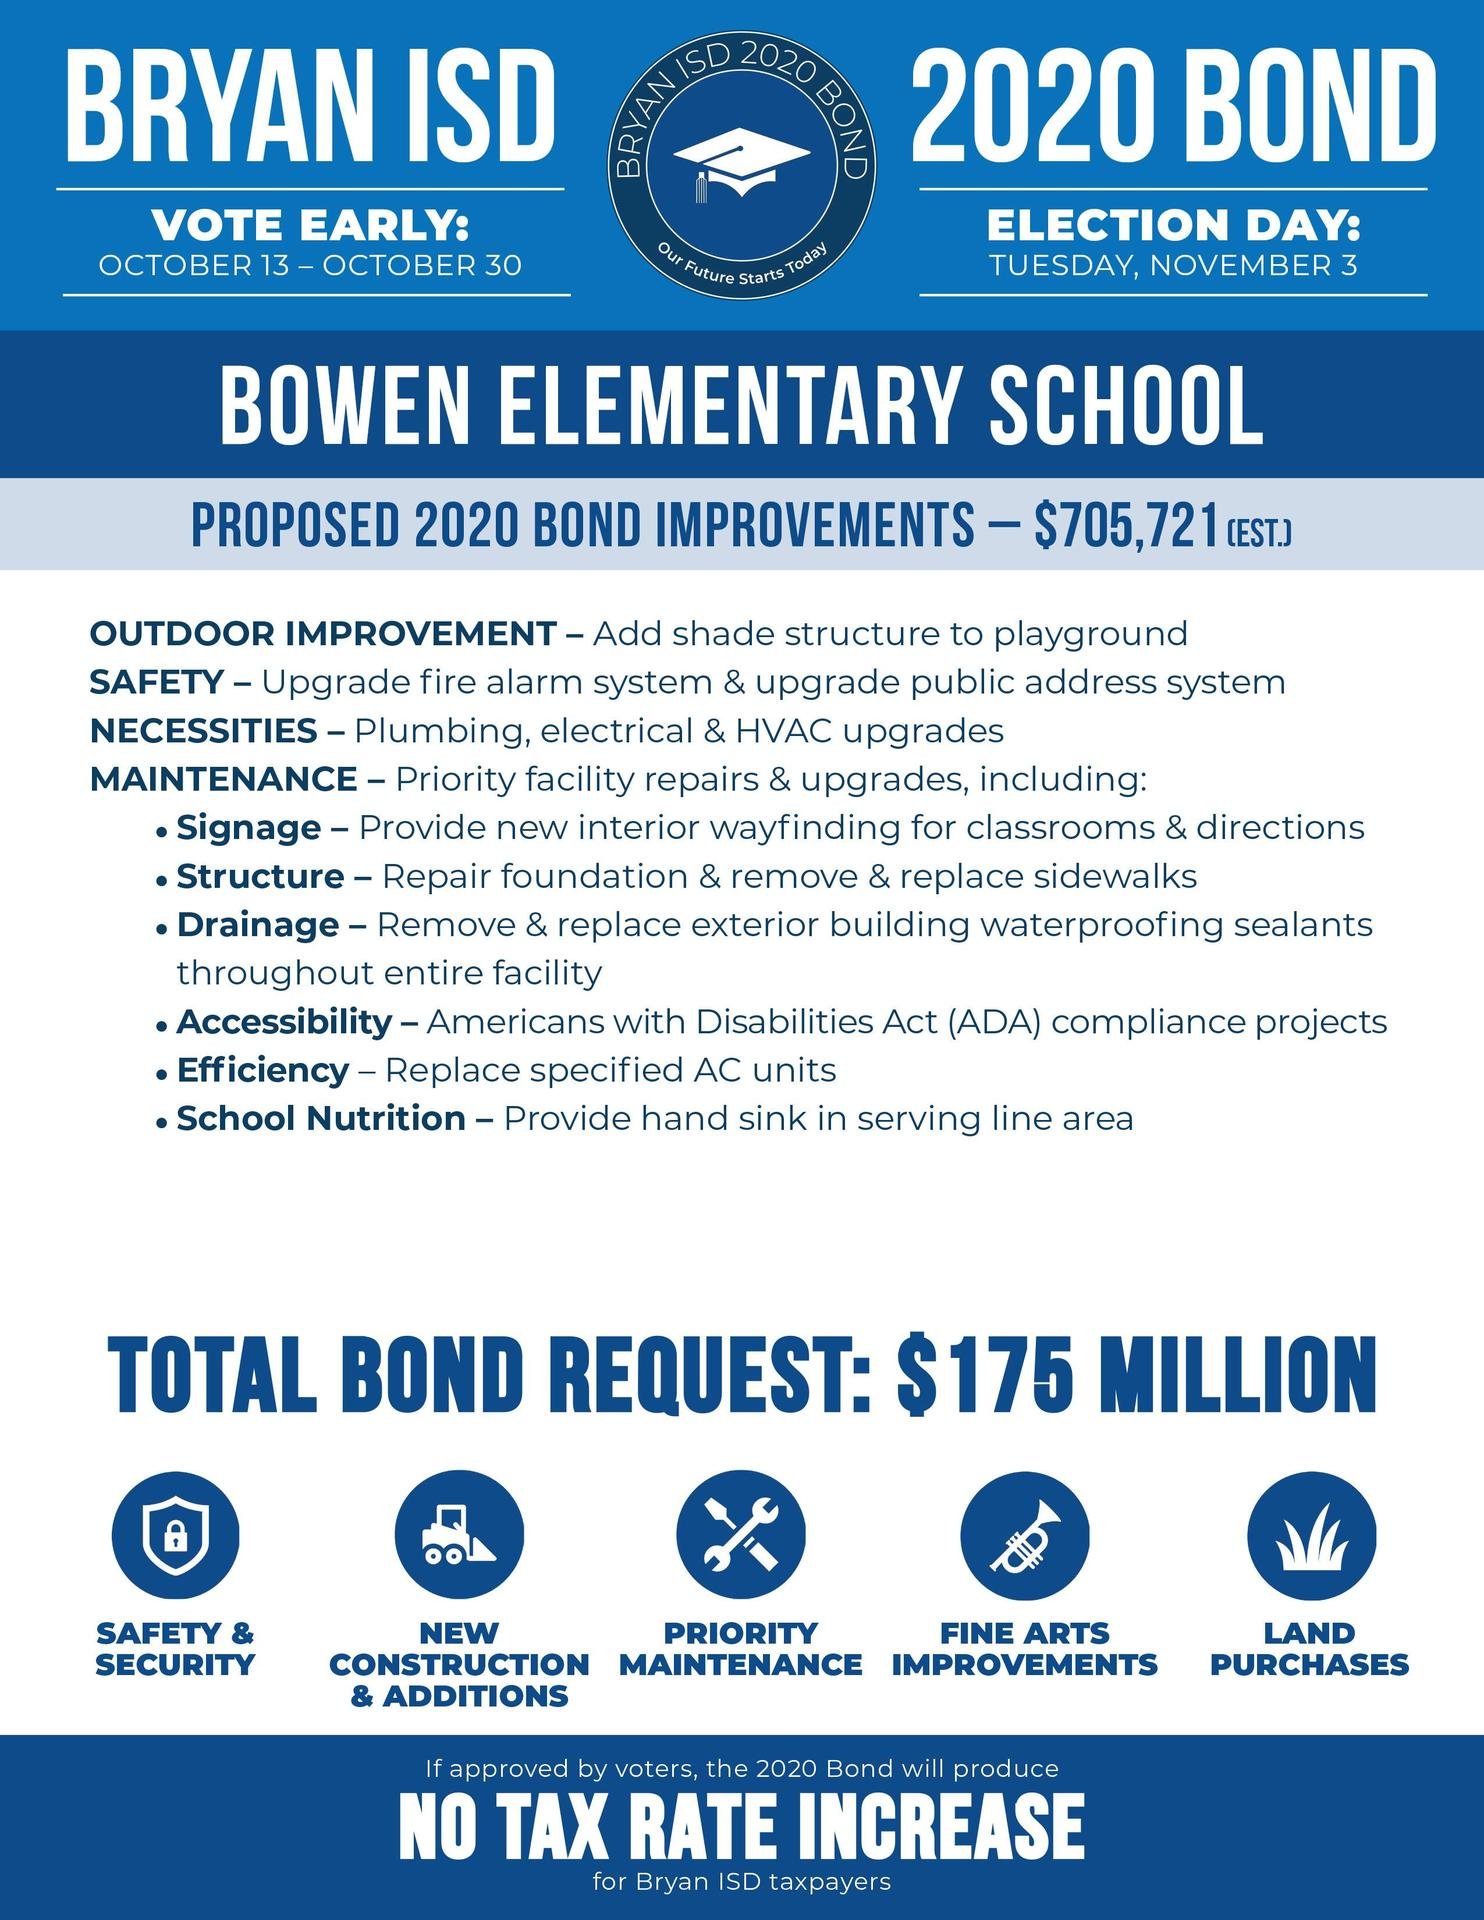 Bowen Elementary School Bond Information